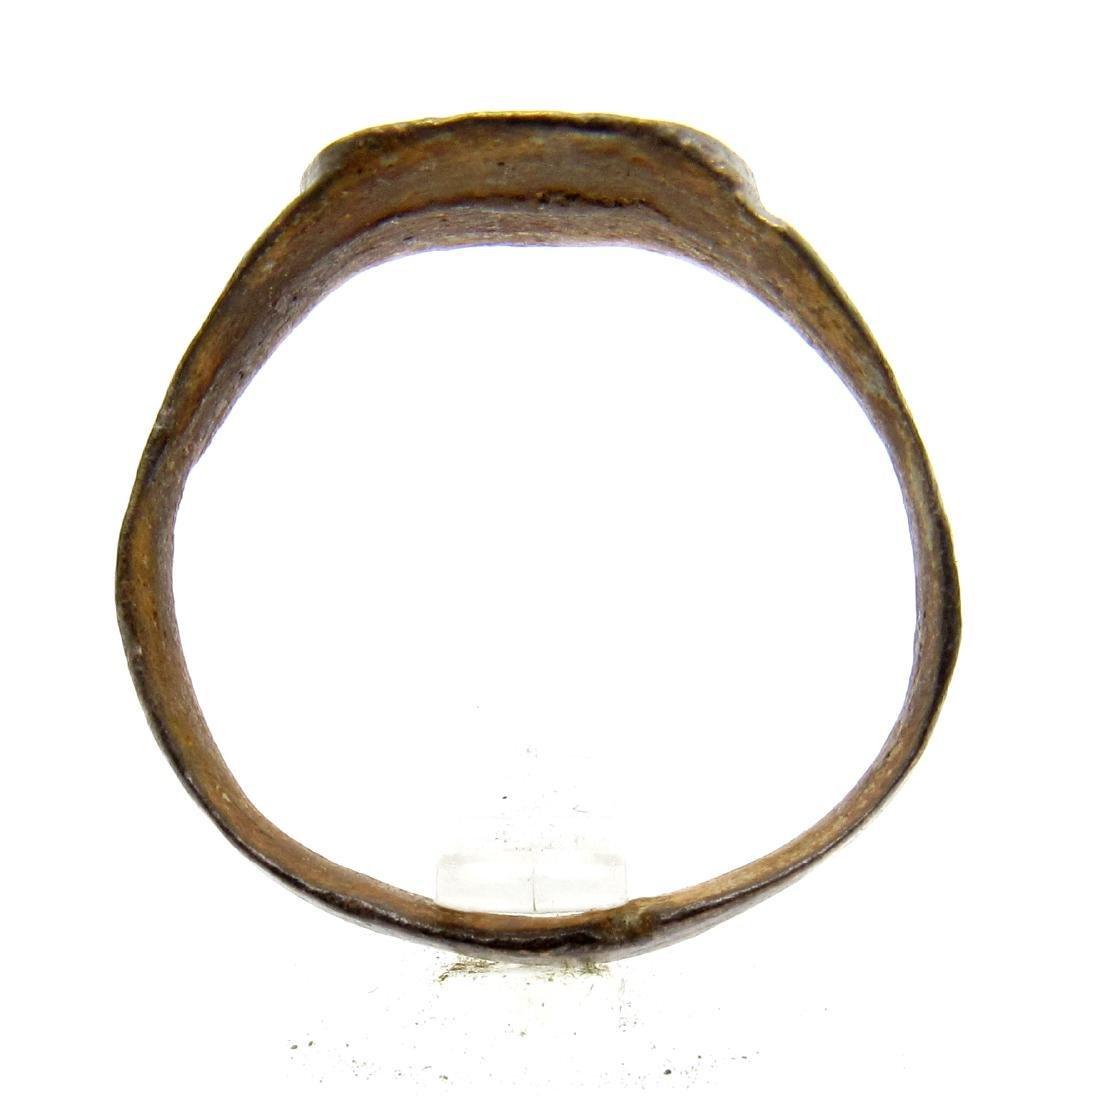 Roman Legionary Ring wtth Decorated Bezel - 3